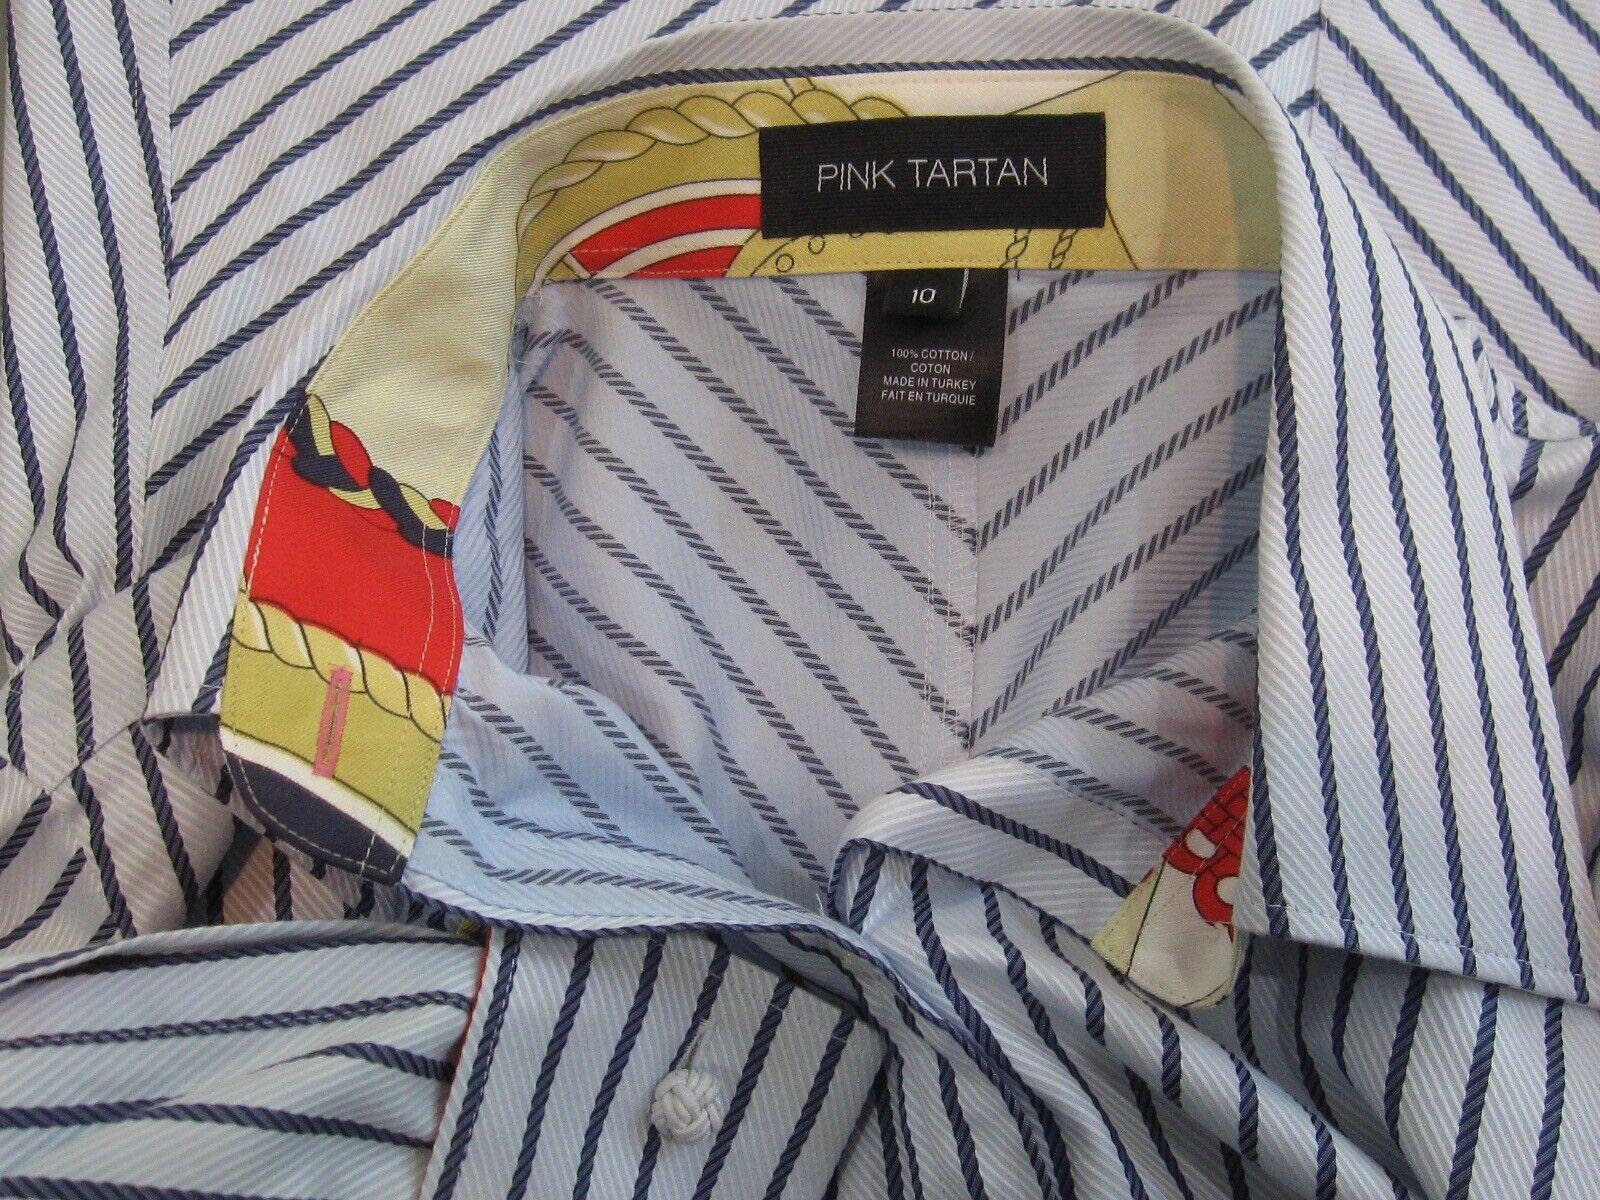 58d6abad7f4aa NWOT PINK TARTAN TARTAN TARTAN Pinstripe Contrasting Design Knot Cuffs Shirt  Sz 10 Monogram 7a1743